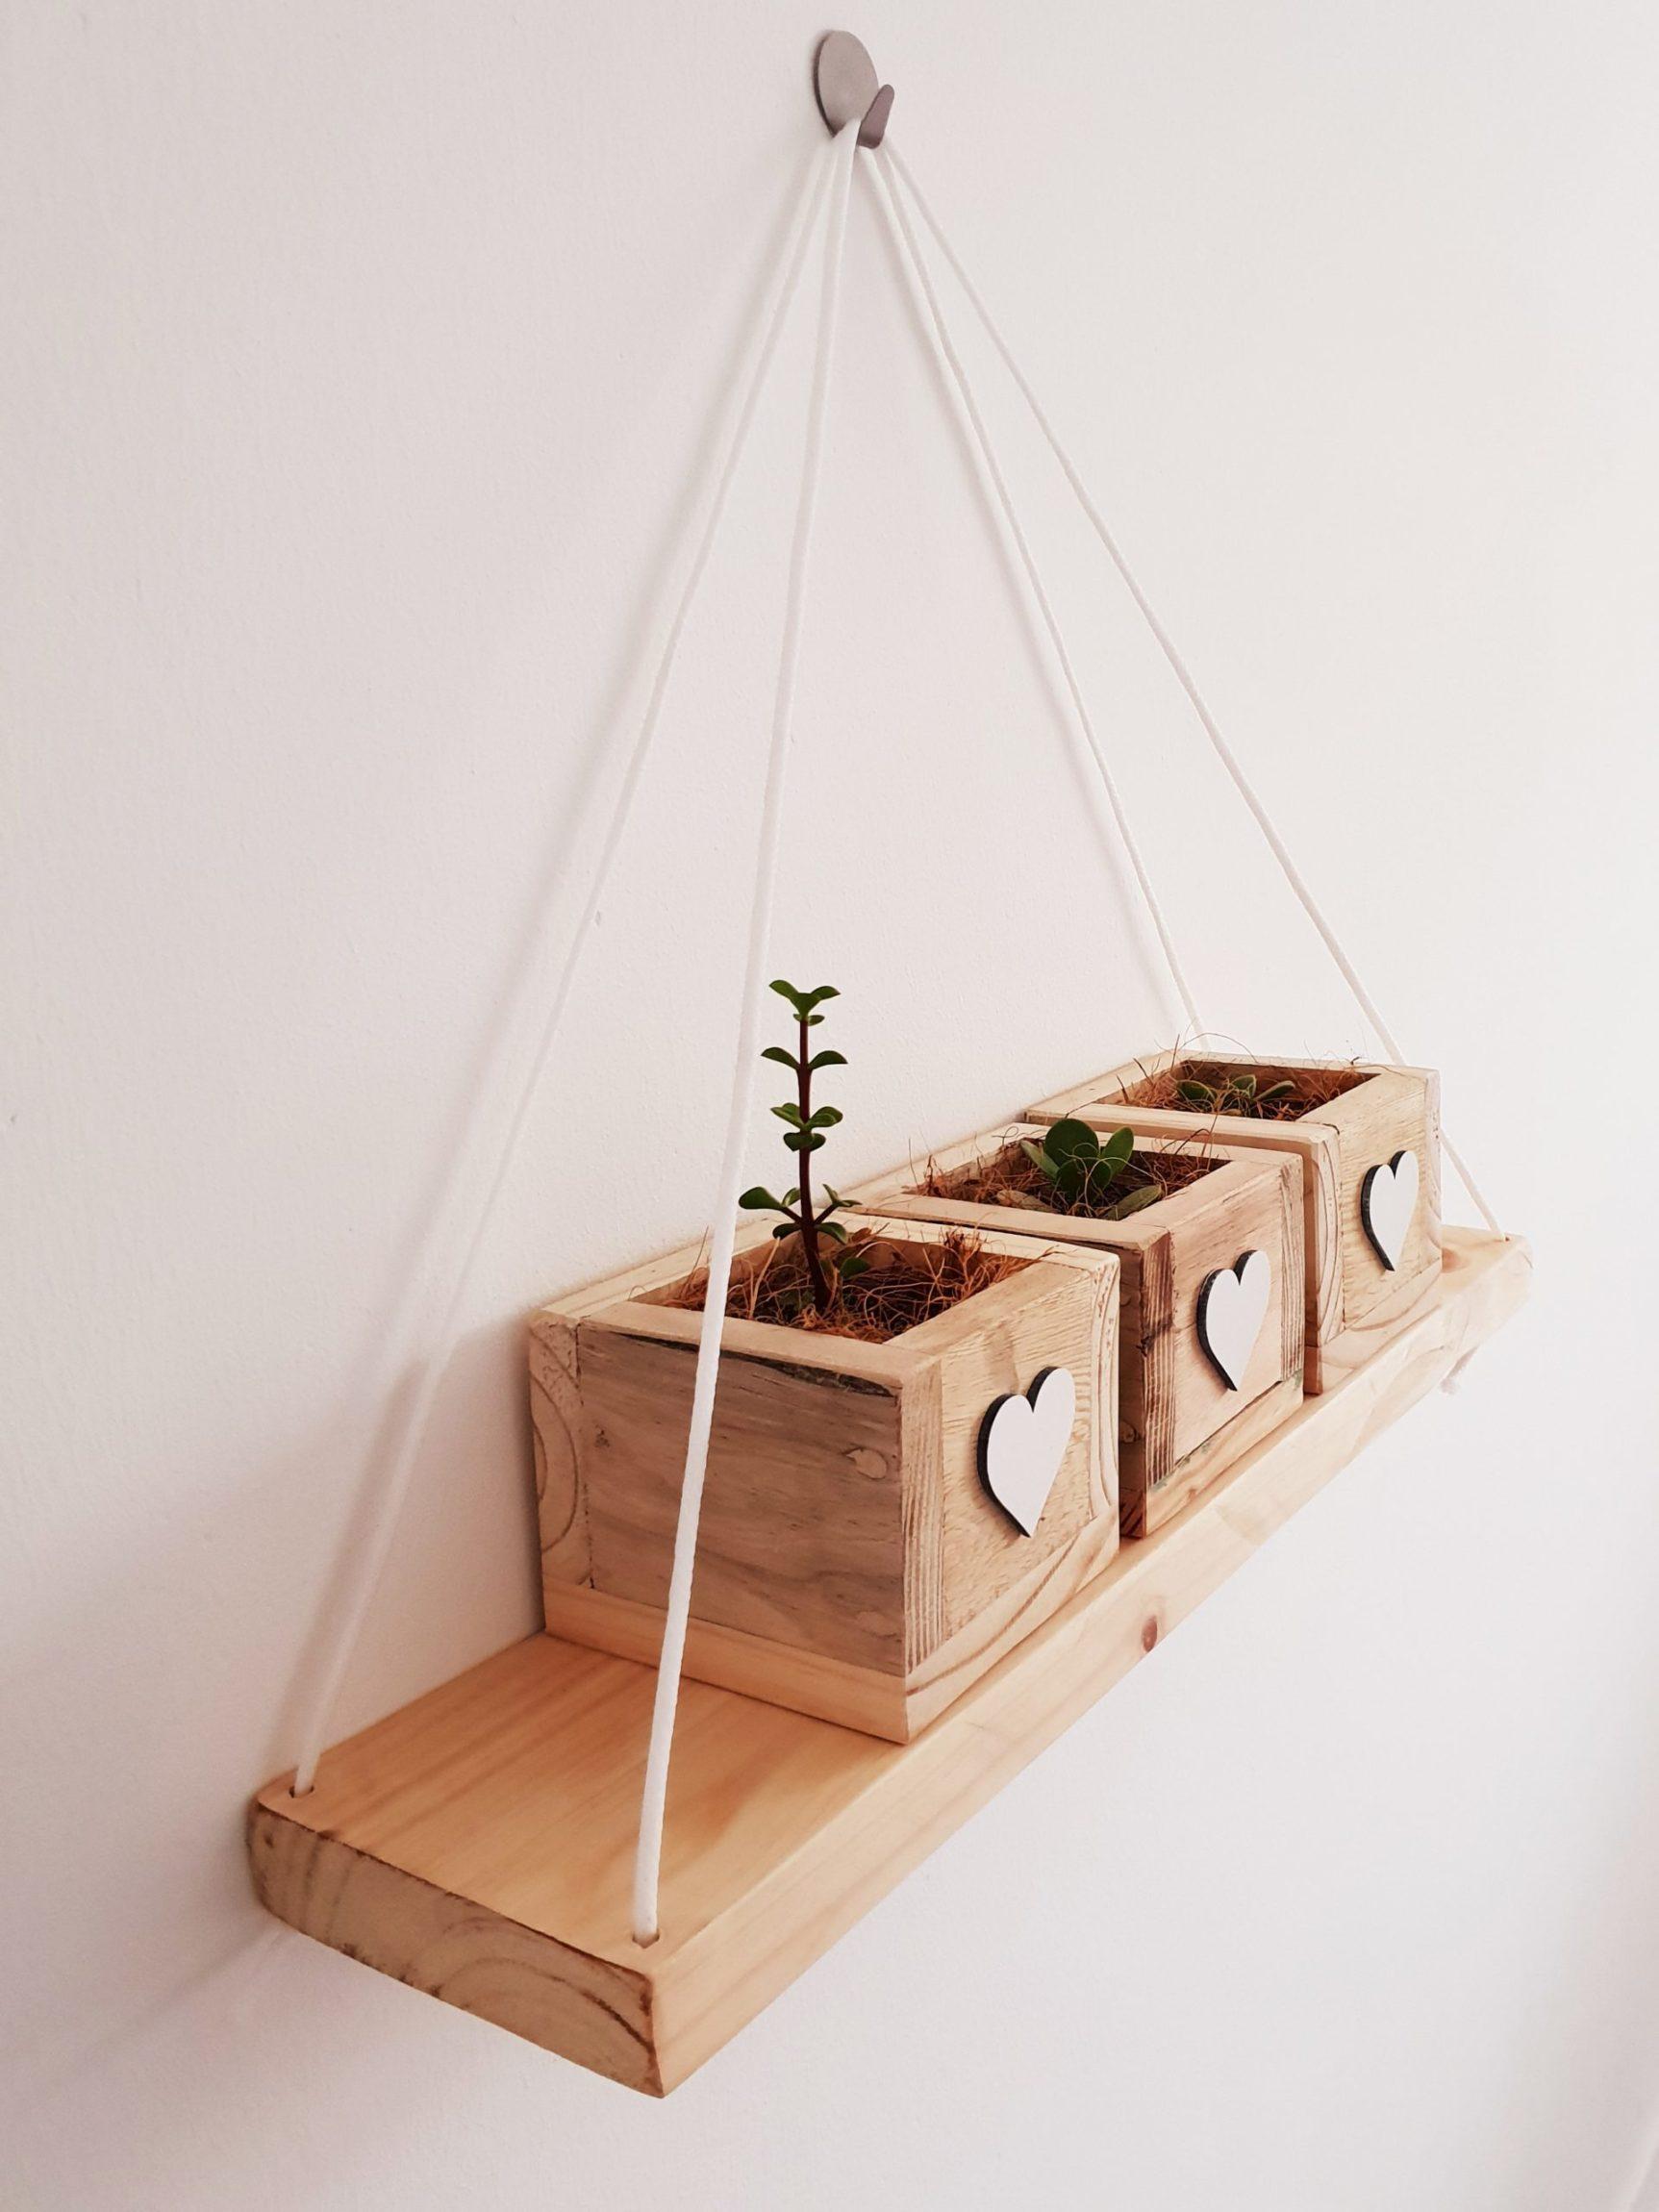 Pine wall hangers